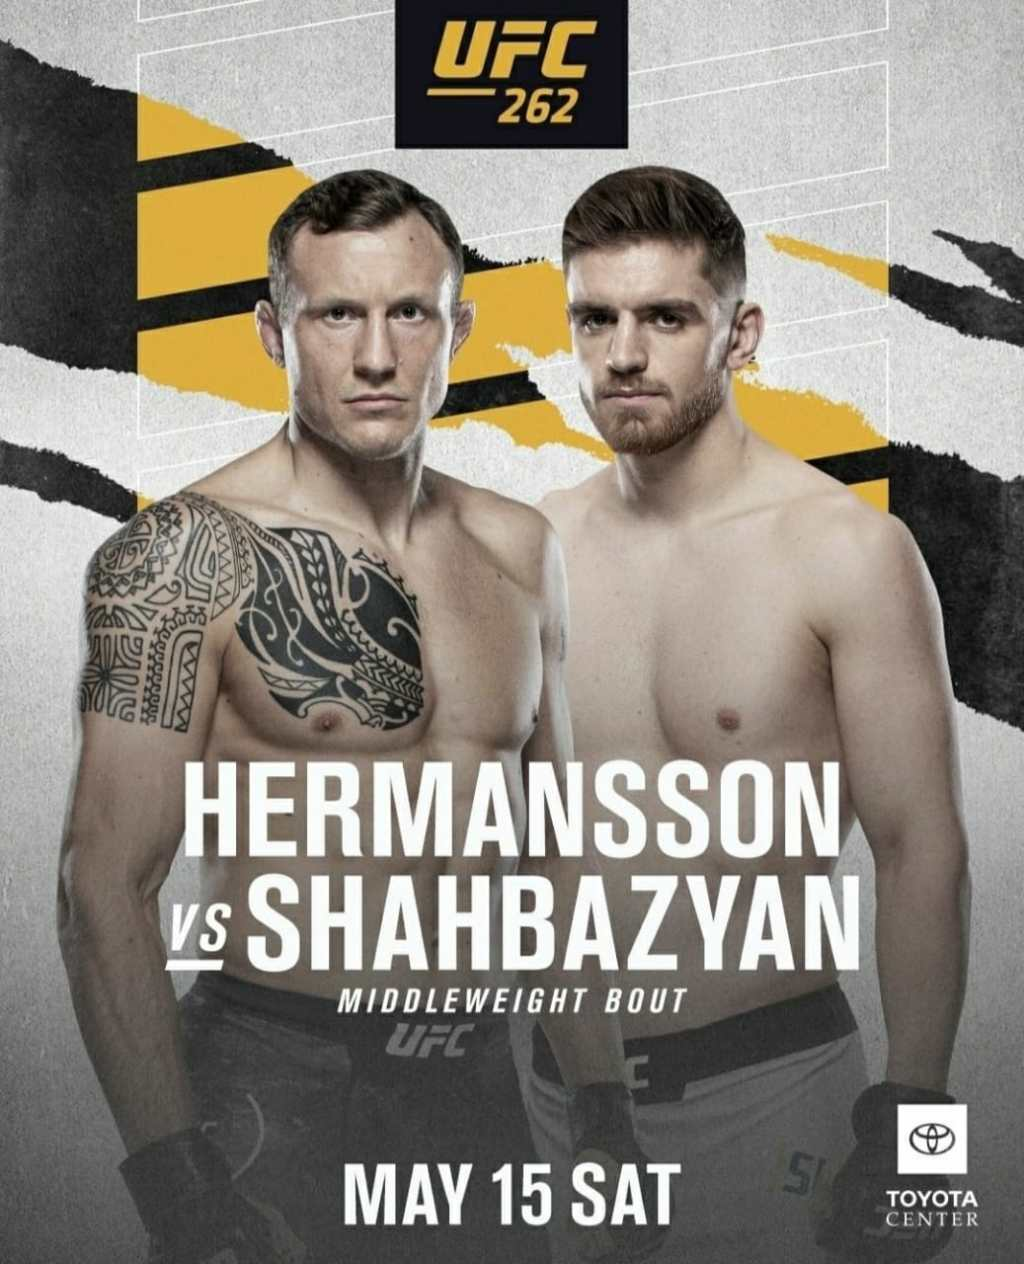 UFC 262 Hermansson vs Shahbazyan | Ultimate Fighting Championship Hermansson vs Shahbazyan